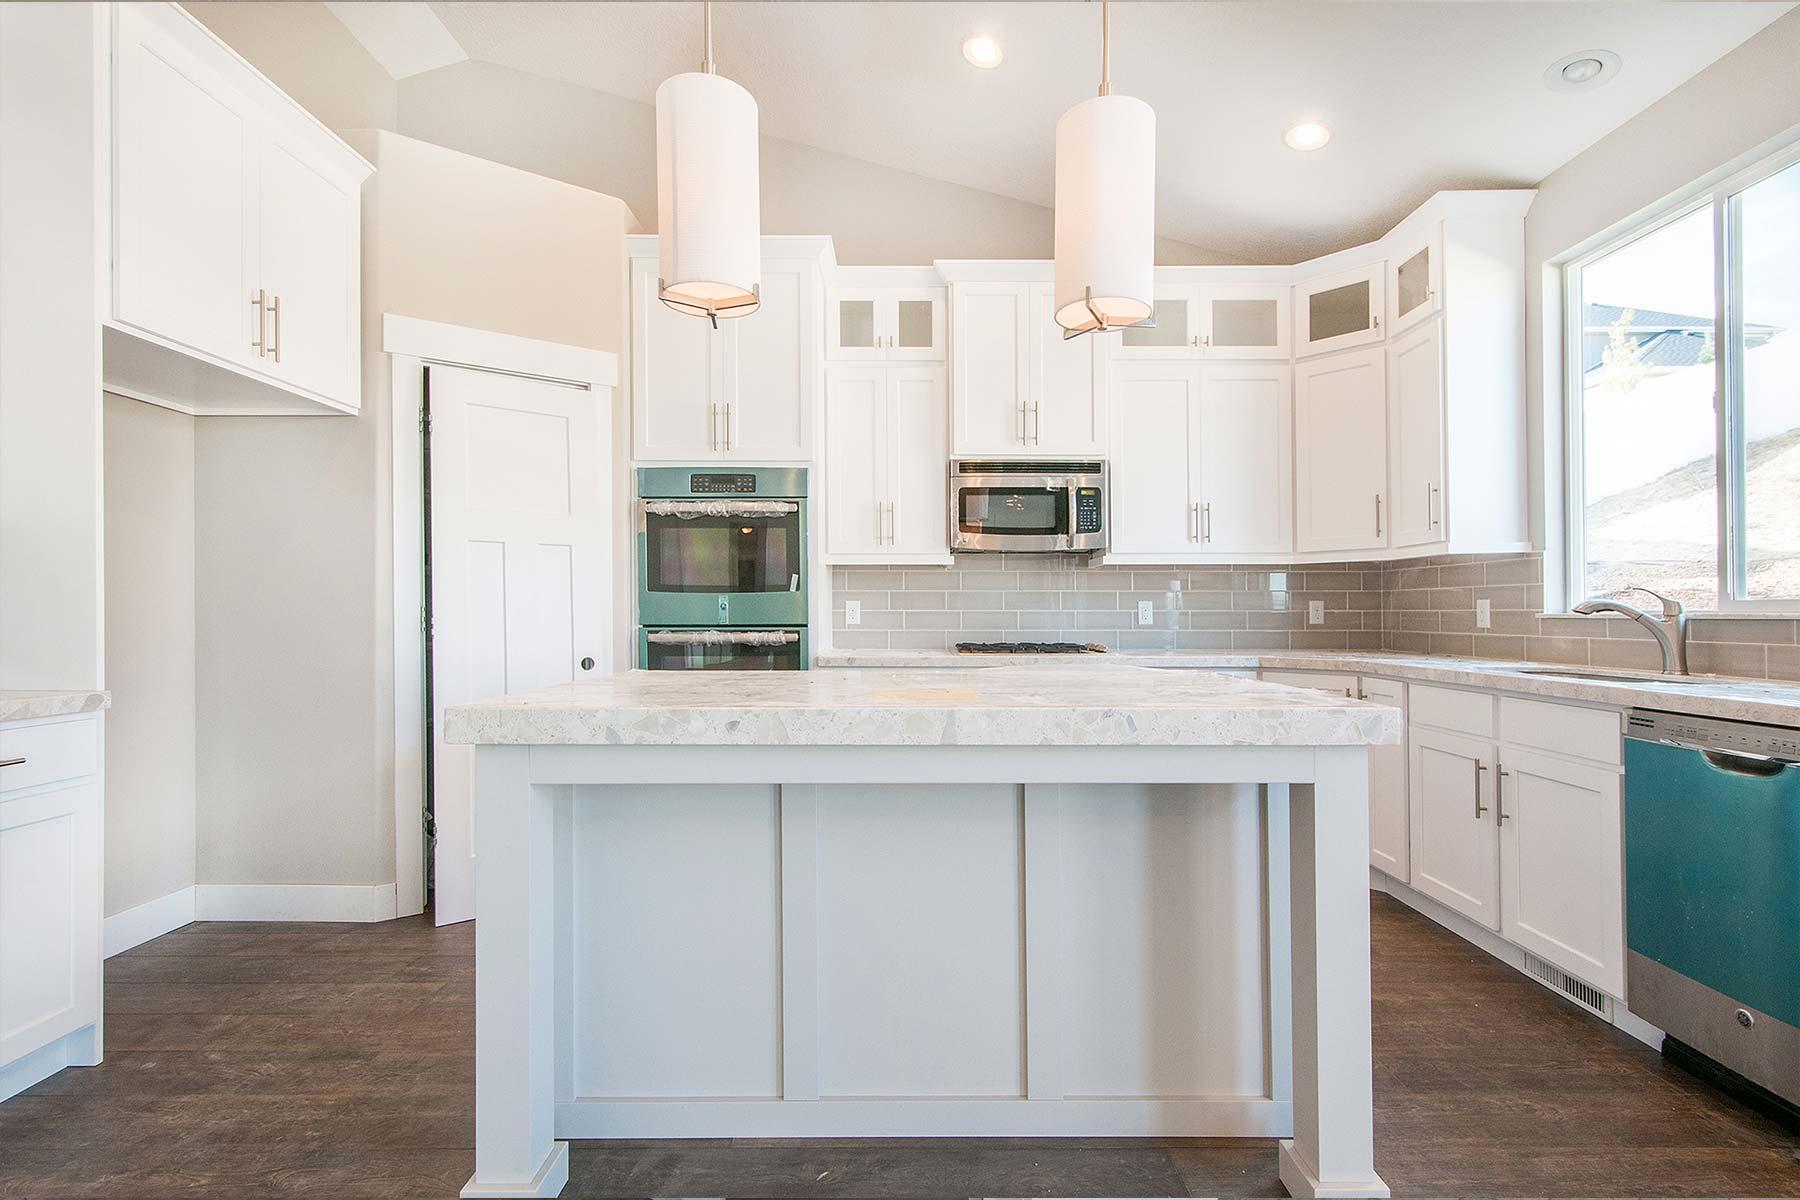 Photo Gallery | Home Center Construction